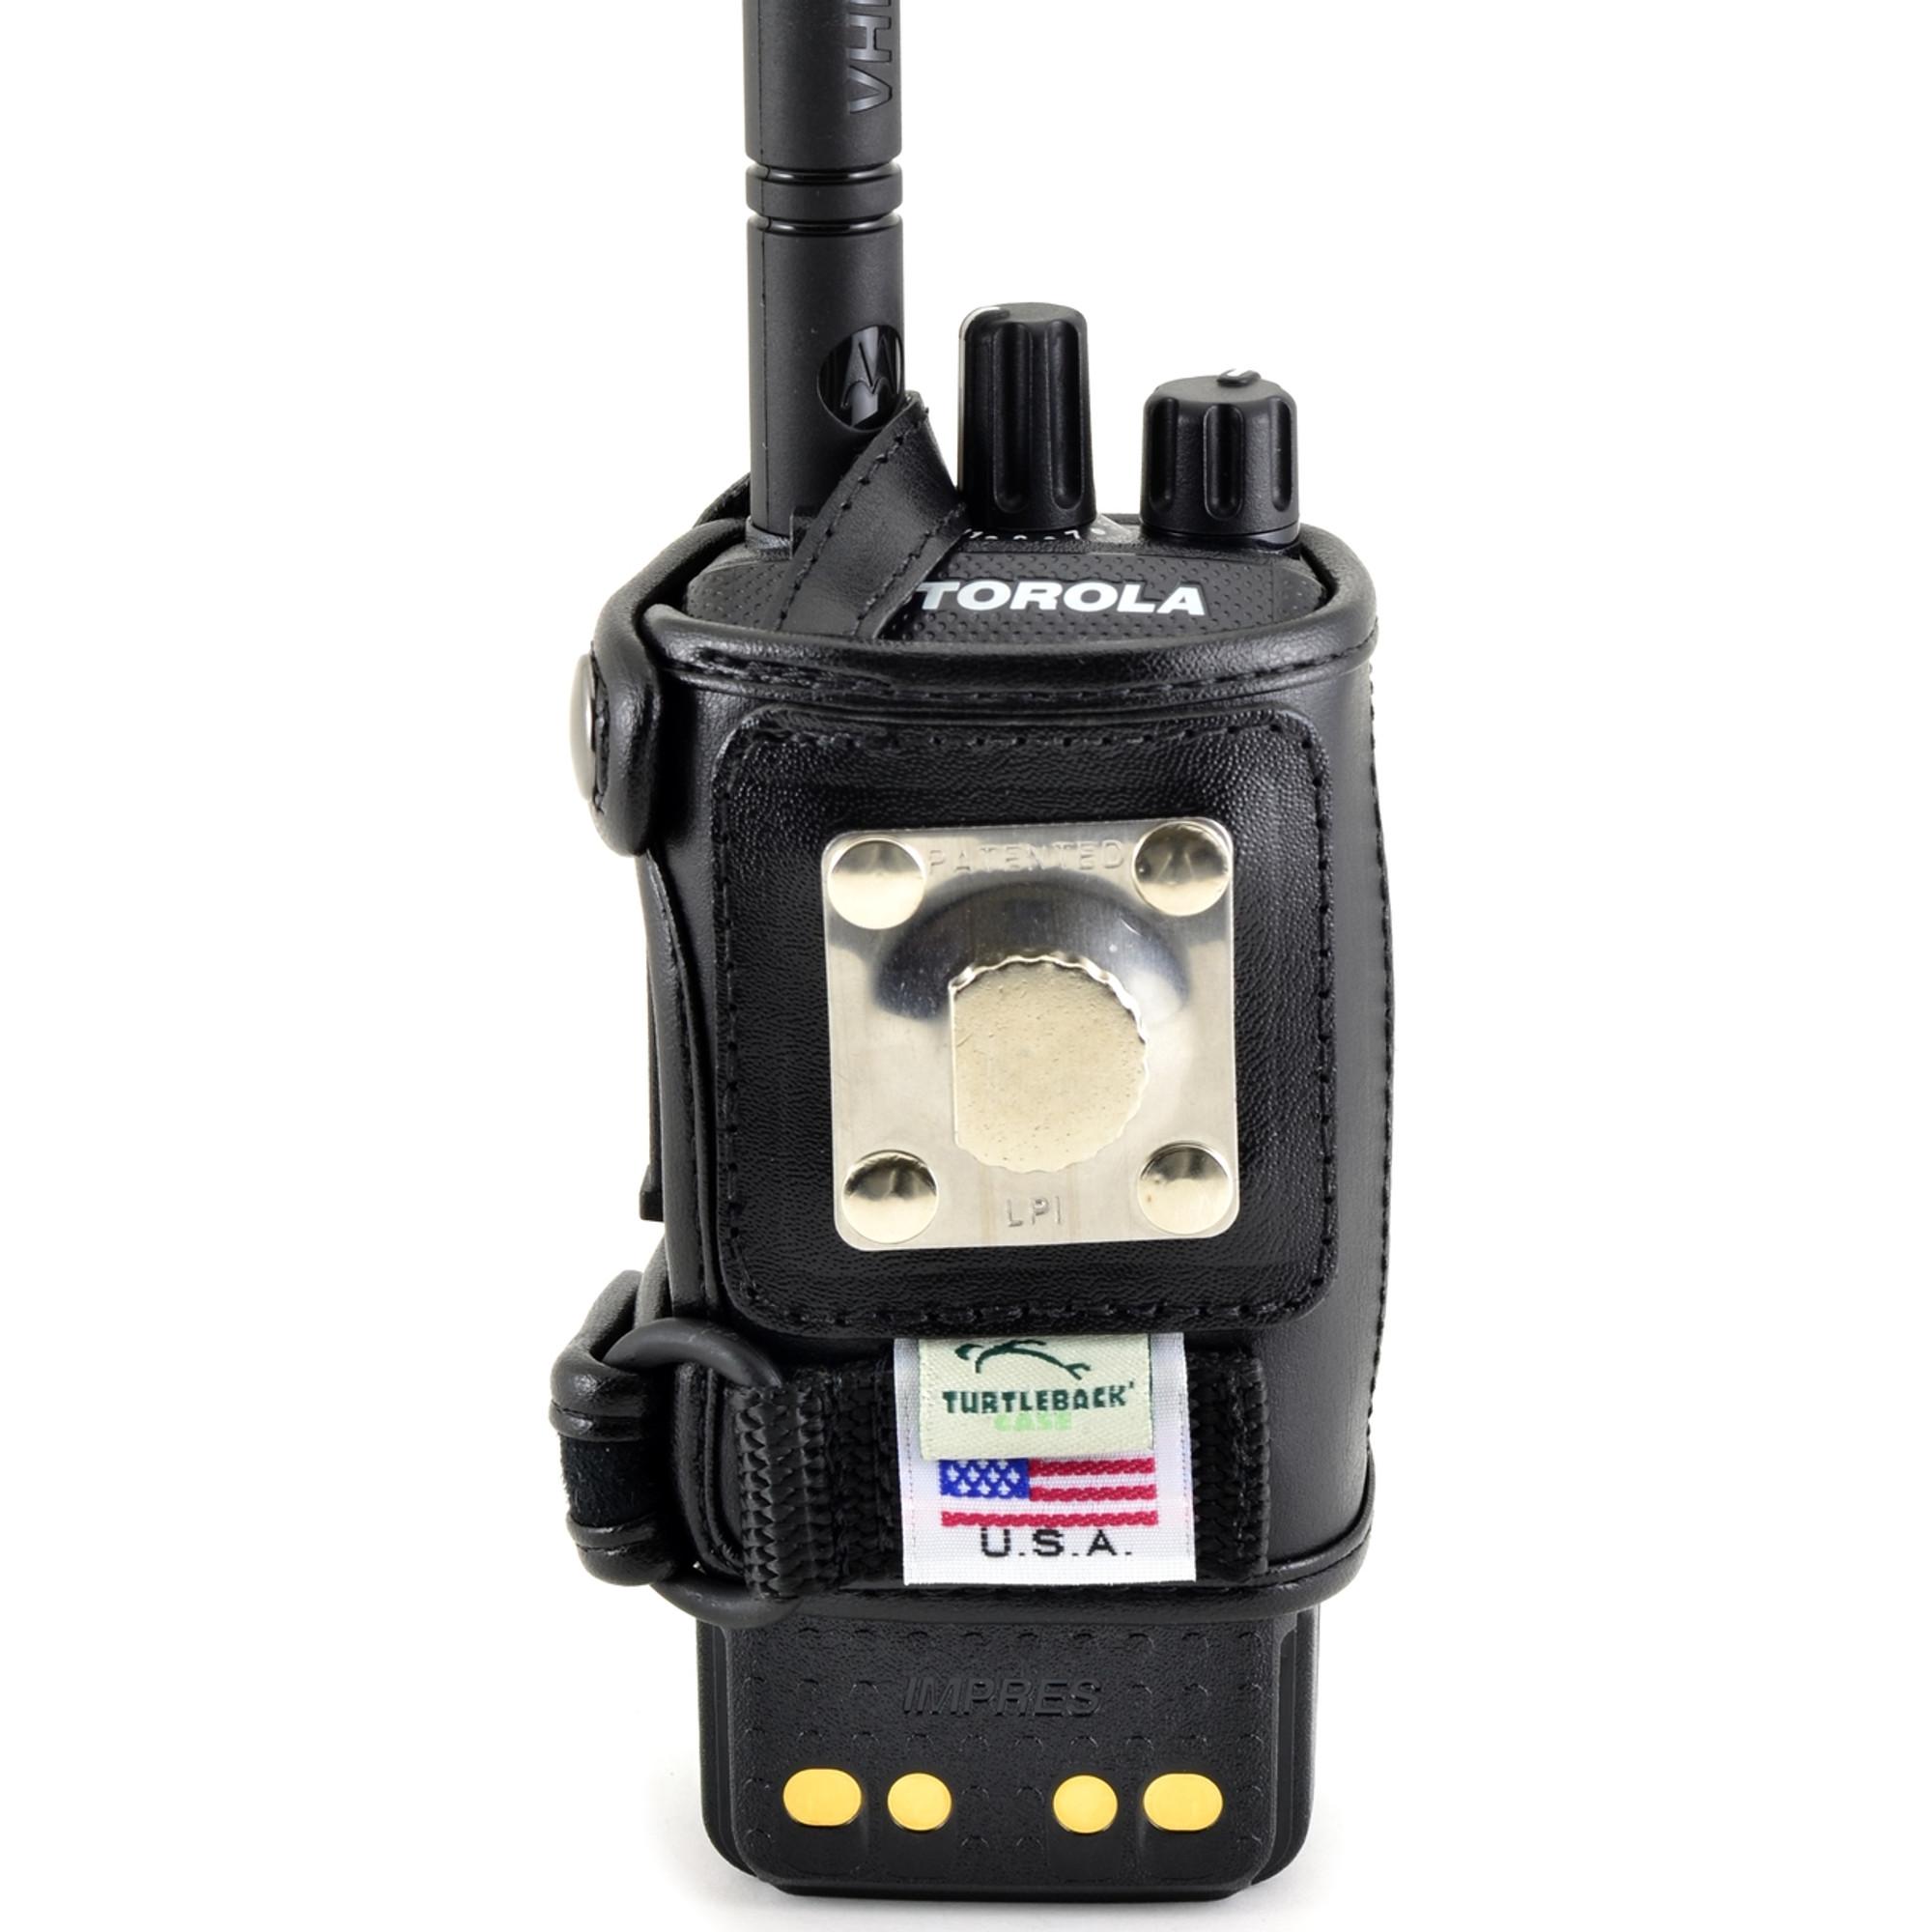 Radio holder motorola apx 6000 -  Motorola Xpr 3500 Belt Holster Fitted Case This Holder Fits Motorola Xpr 3500 Radio Black